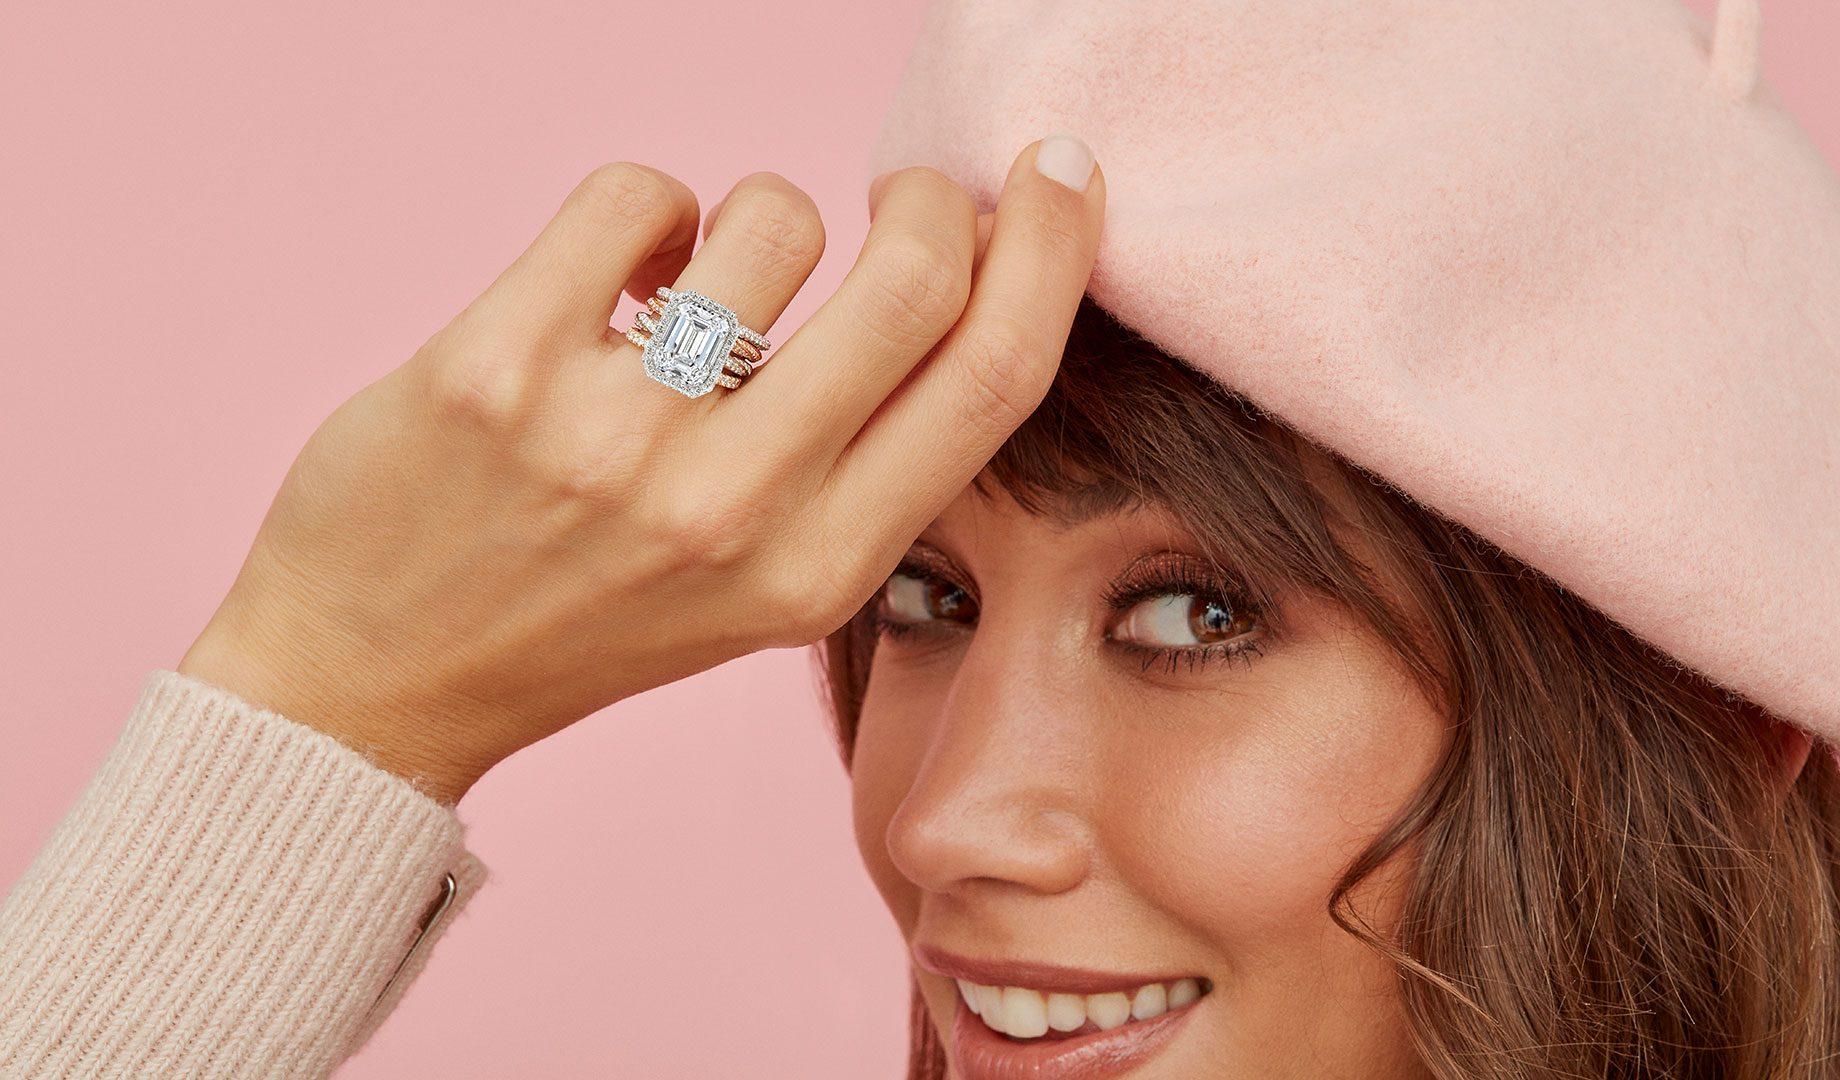 Camille Emerald Lab Grown Diamond Ring on Model